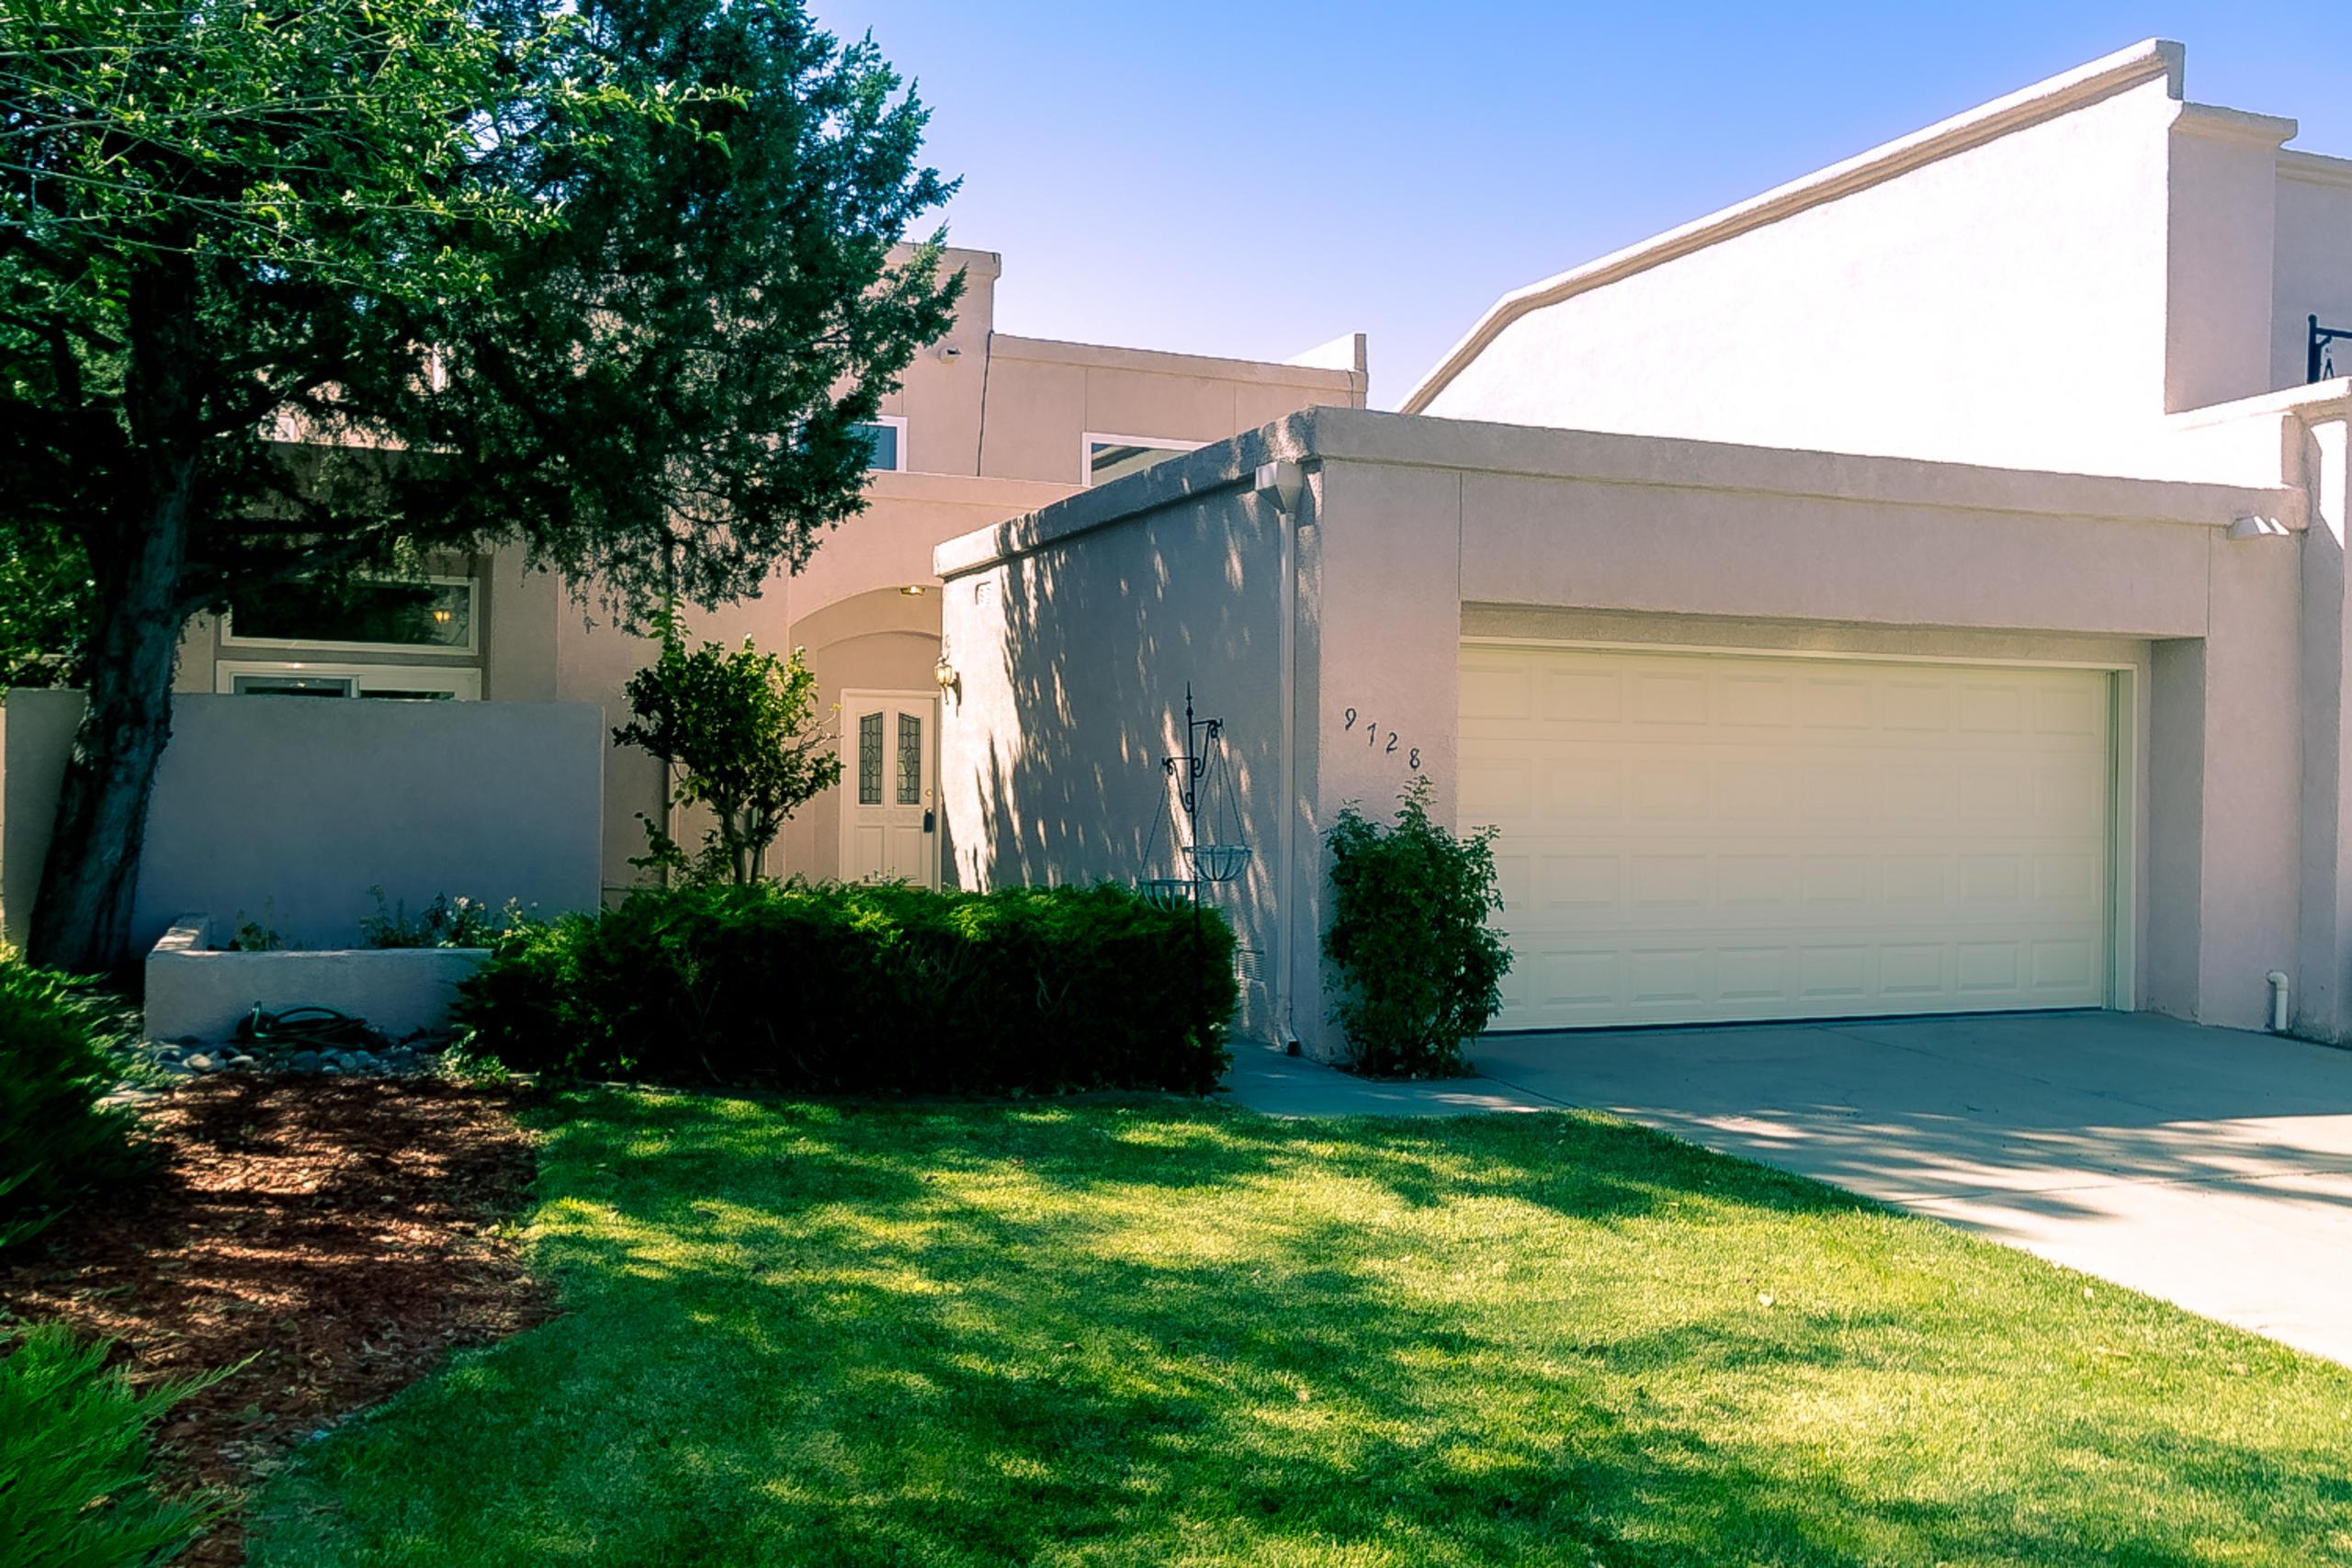 9728 Colonial Circle, Albuquerque NM 87111